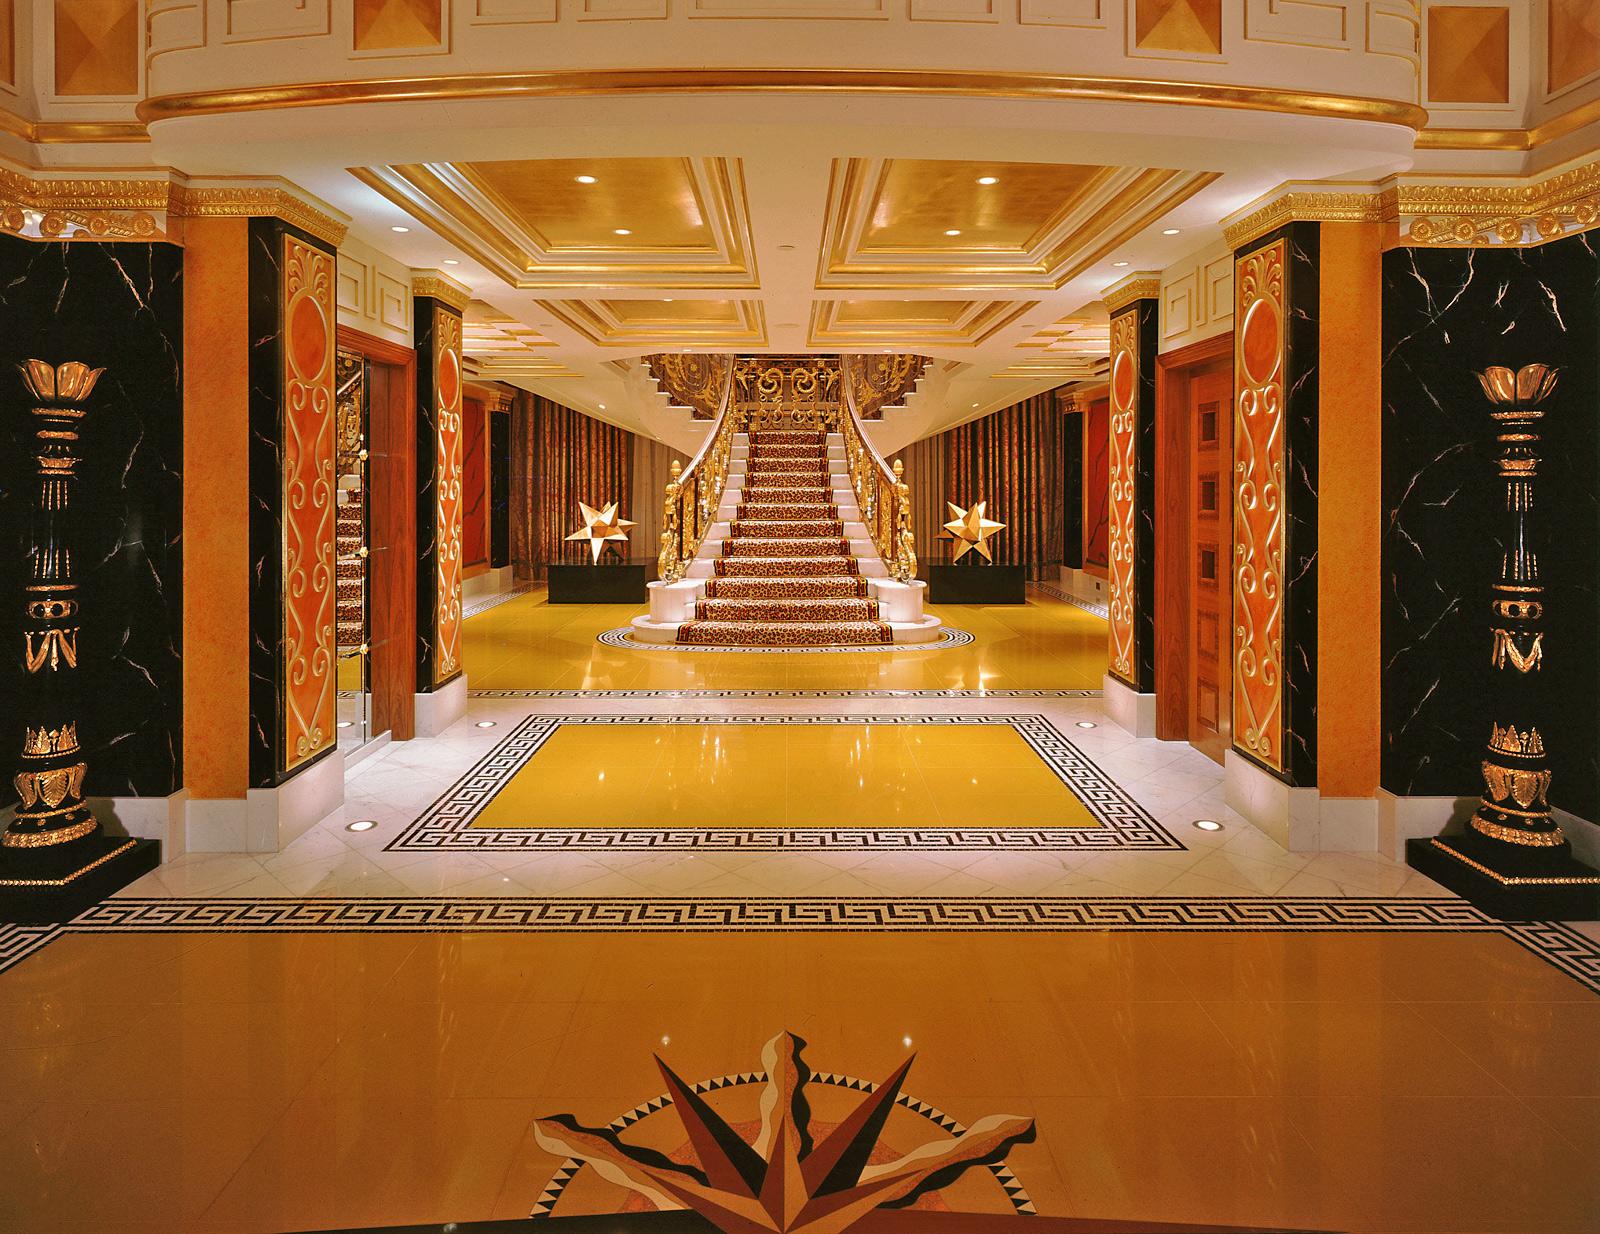 Burj al arab hotel the tourist magnet of dubai latest for Al burj hotel